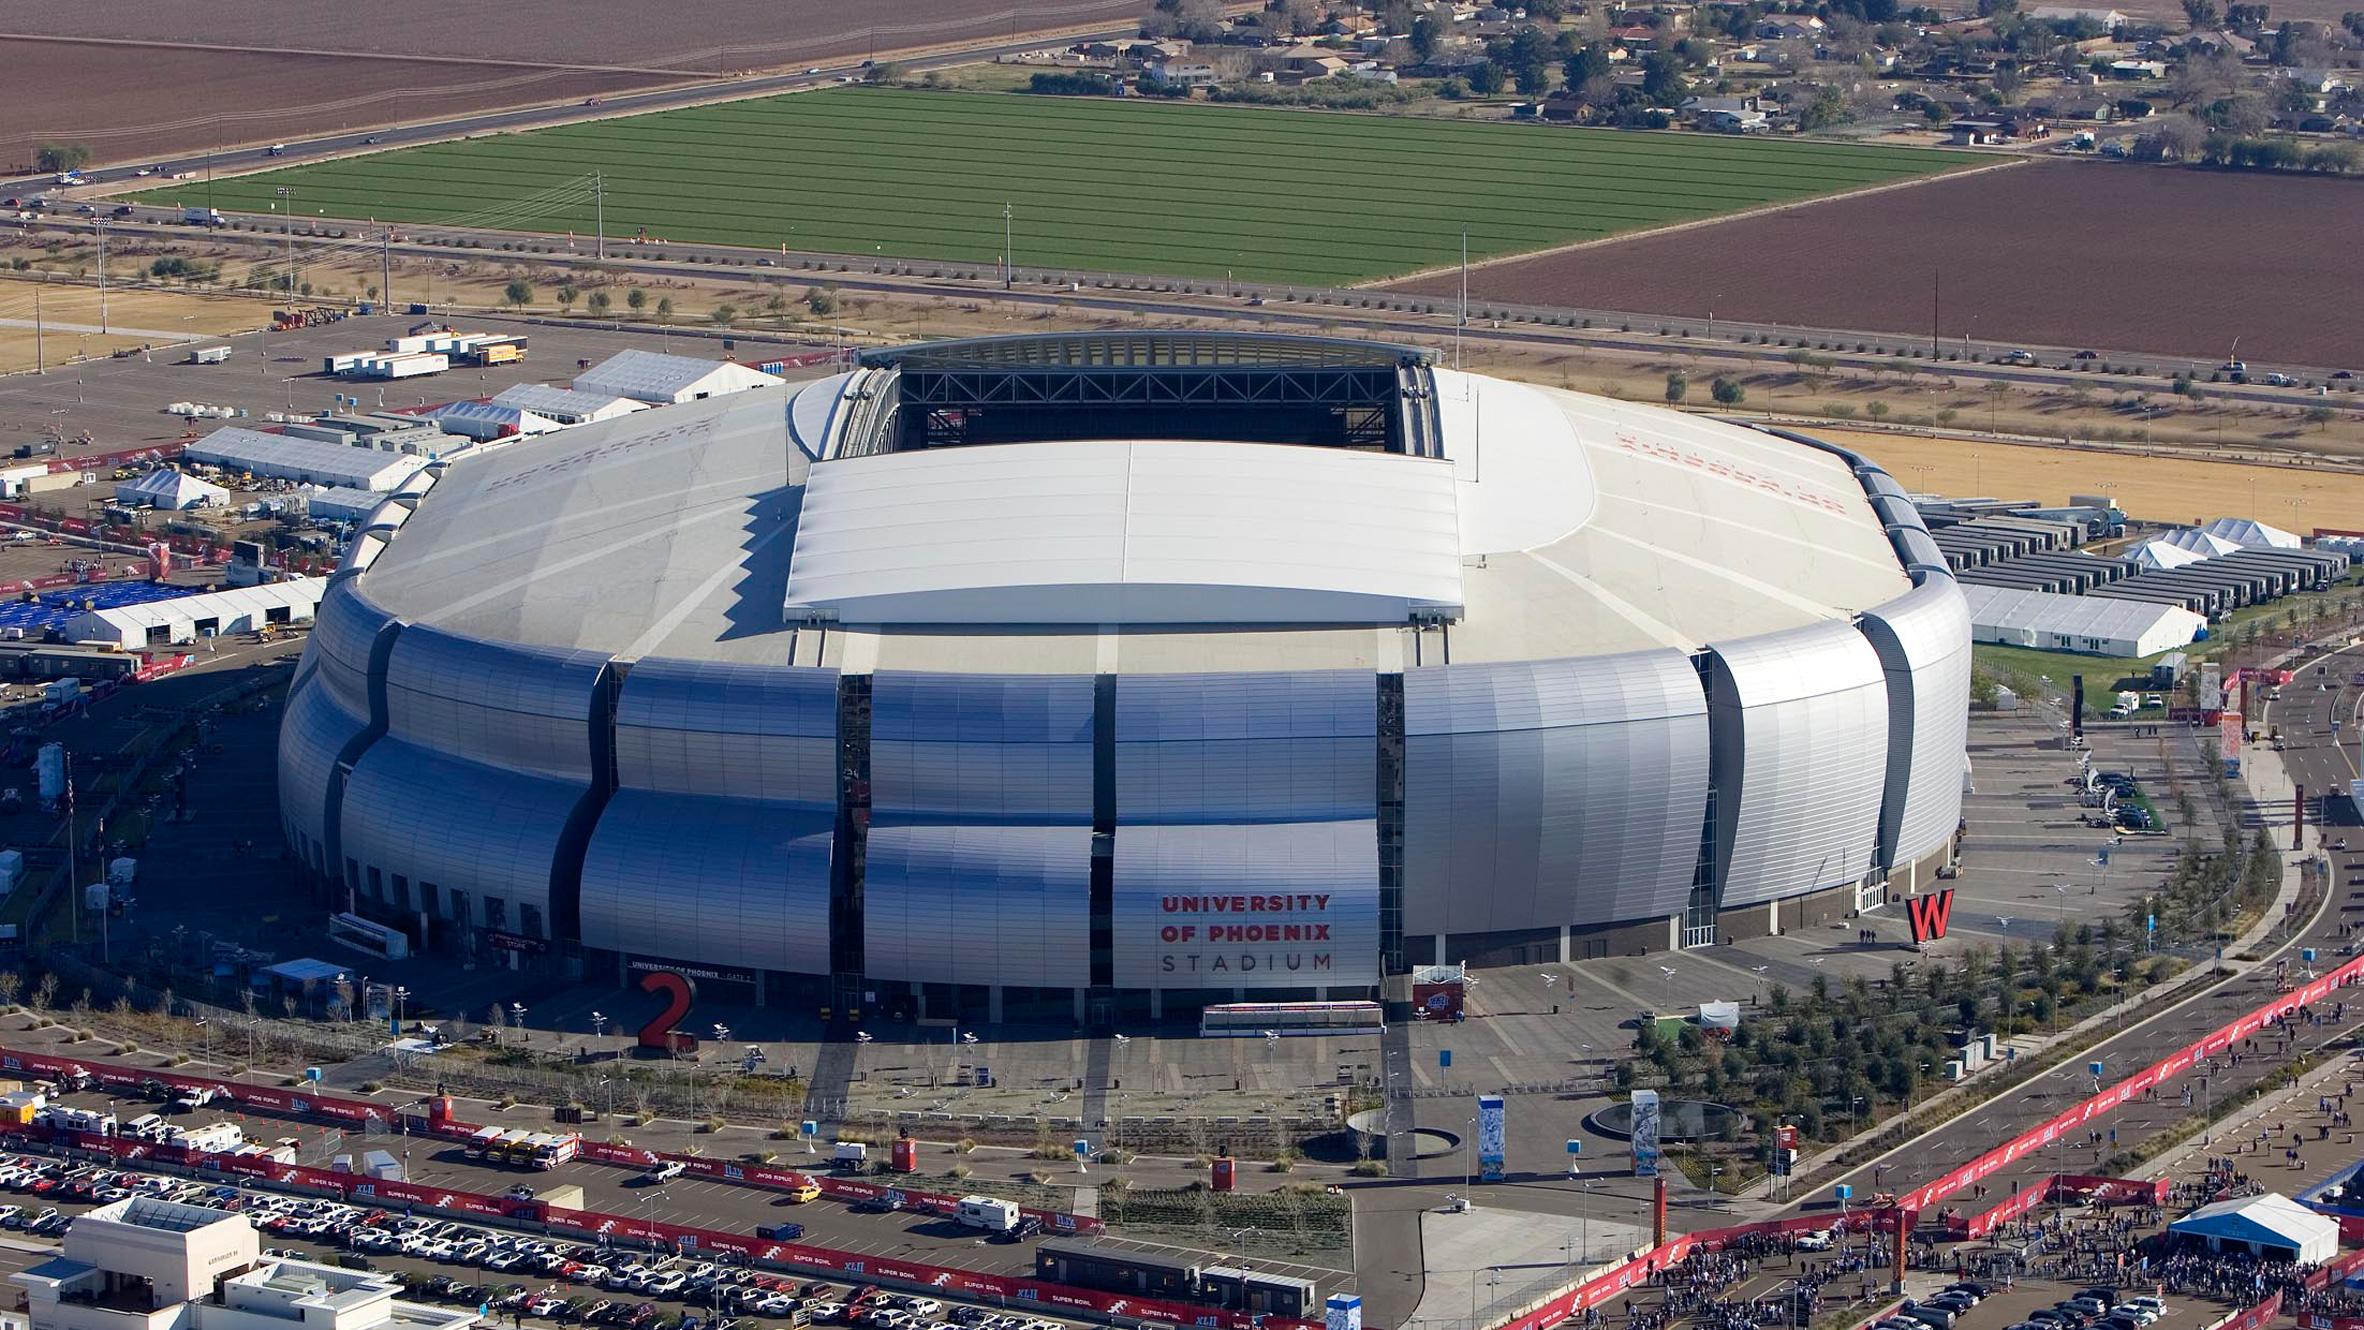 University of Phoenix Stadium by Peter Eisenman, Glendale, Arizona